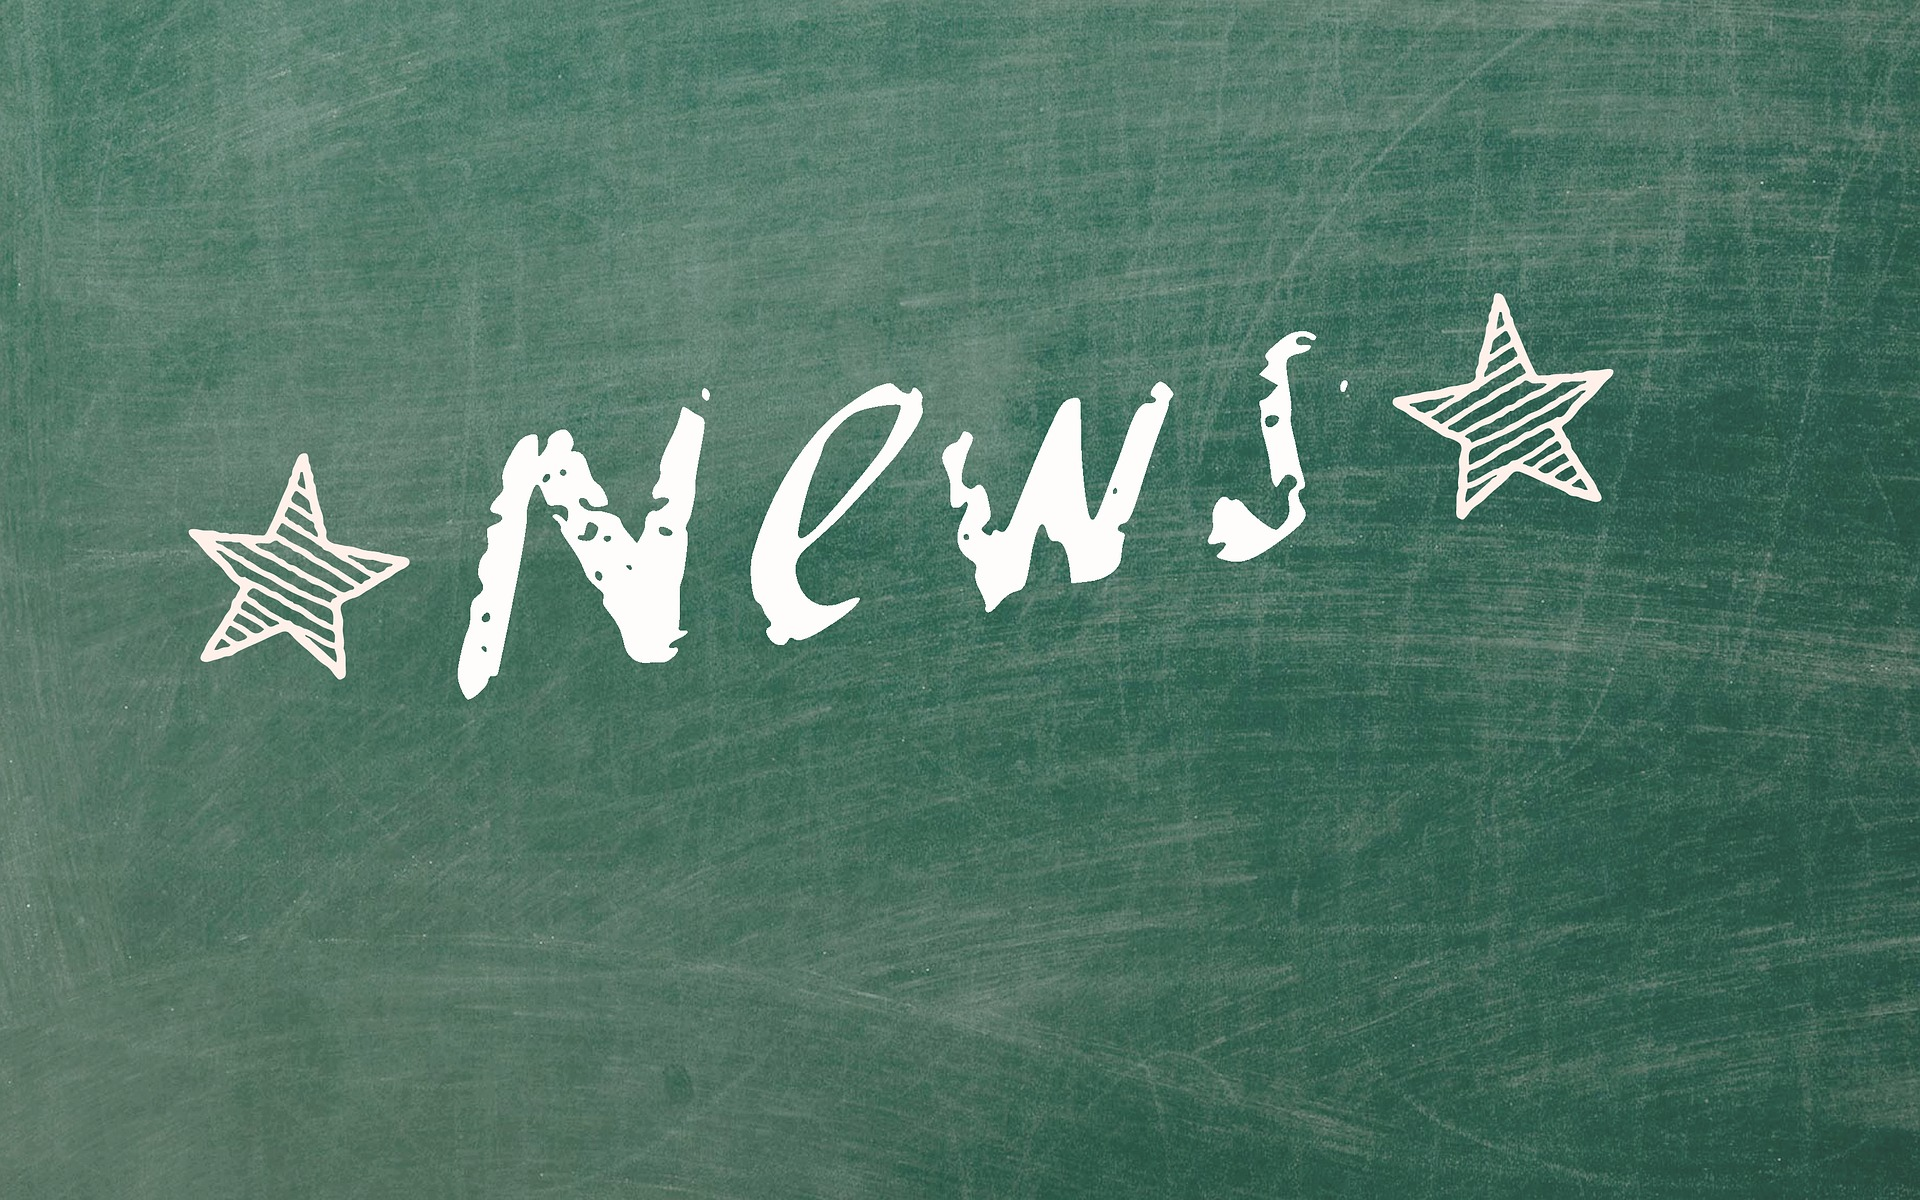 news-1767492_1920